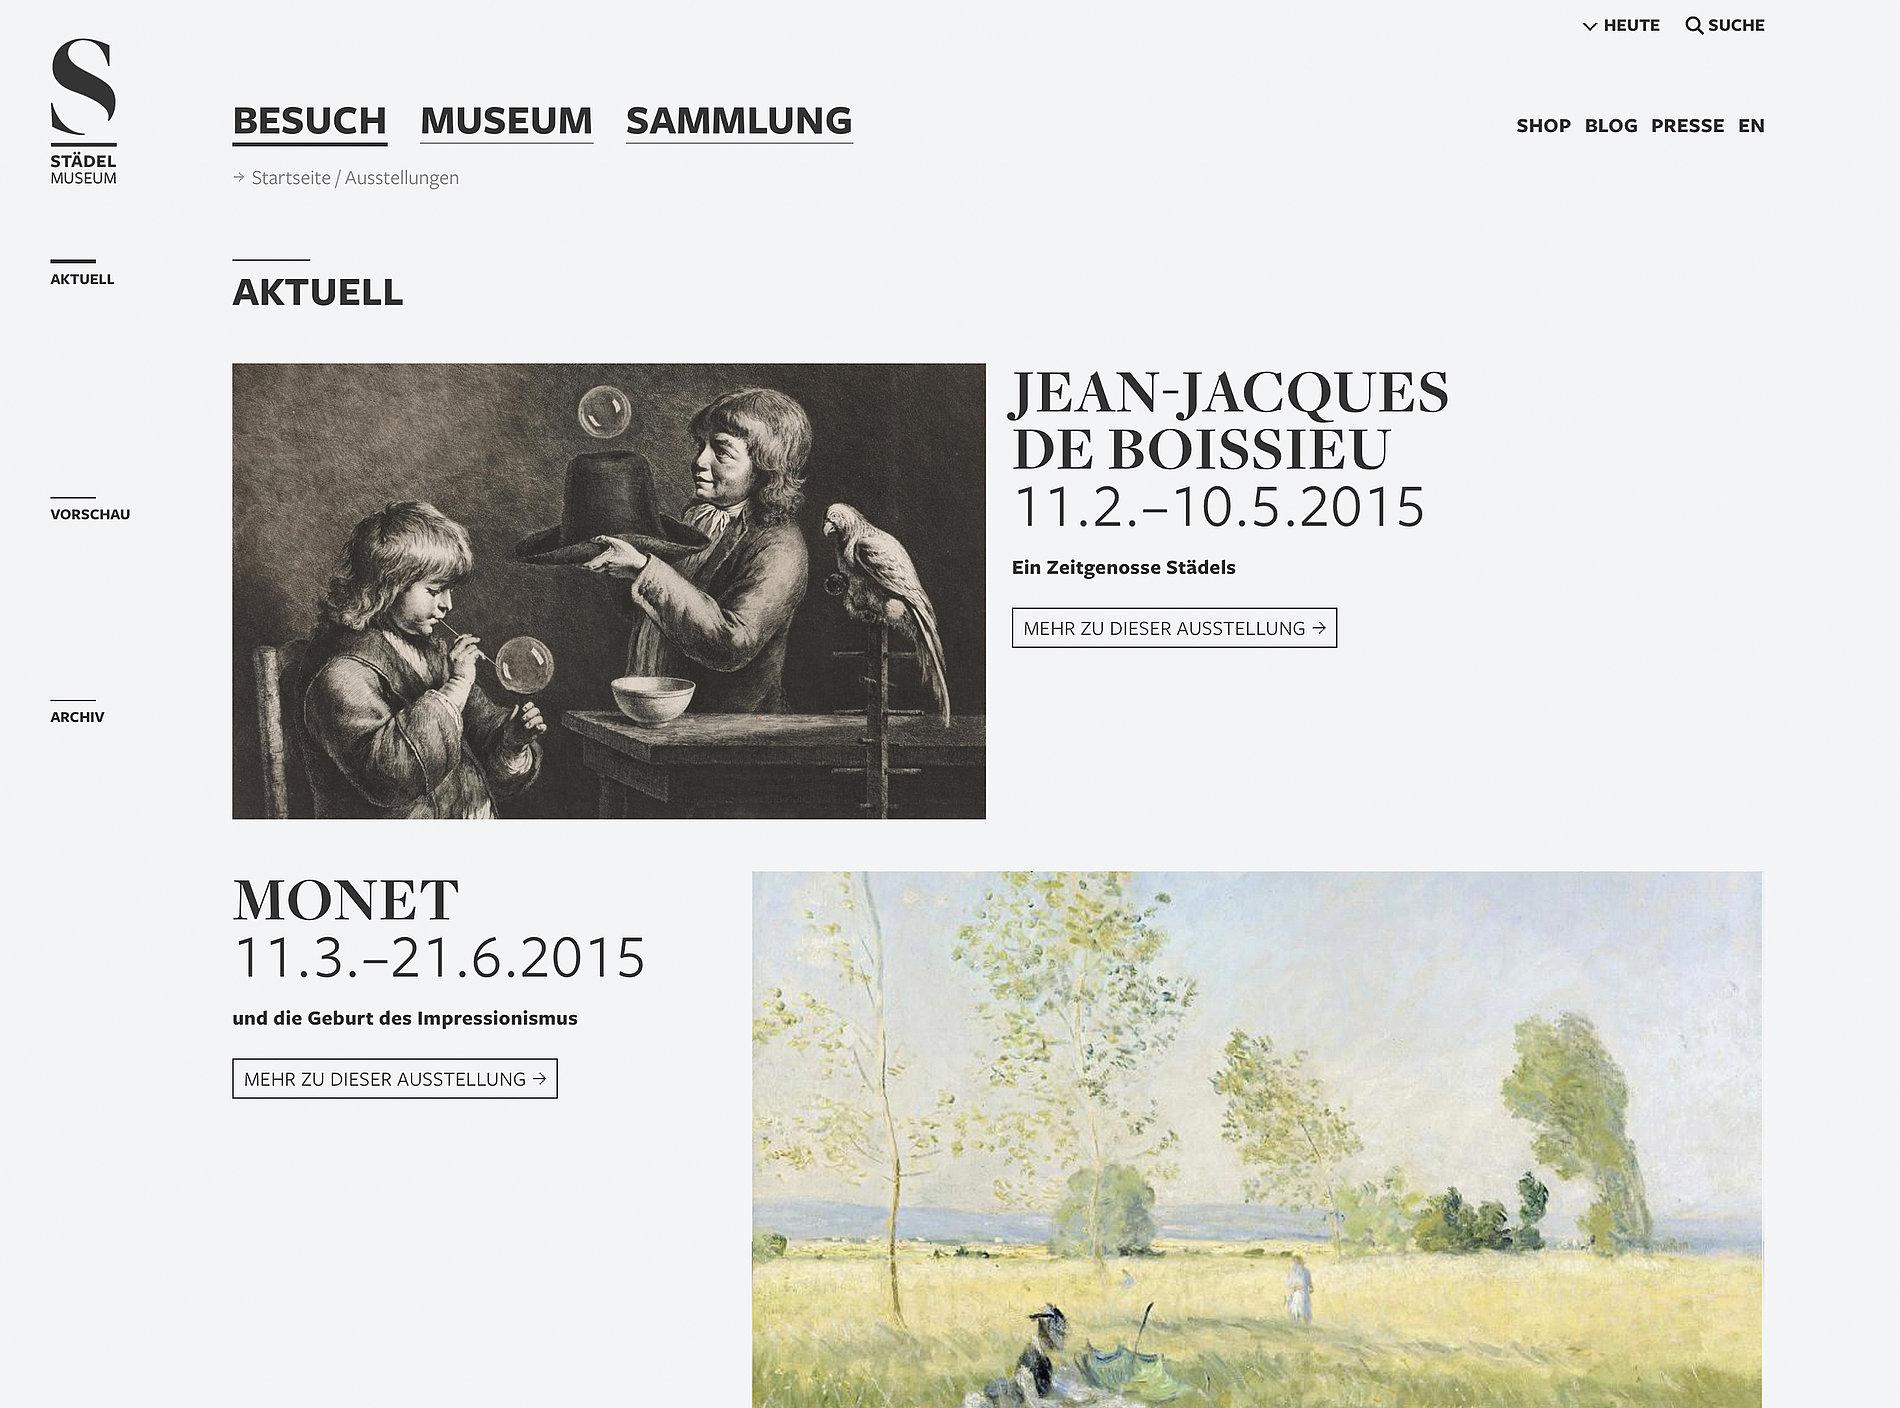 staedelmuseum.de | Red Dot Design Award